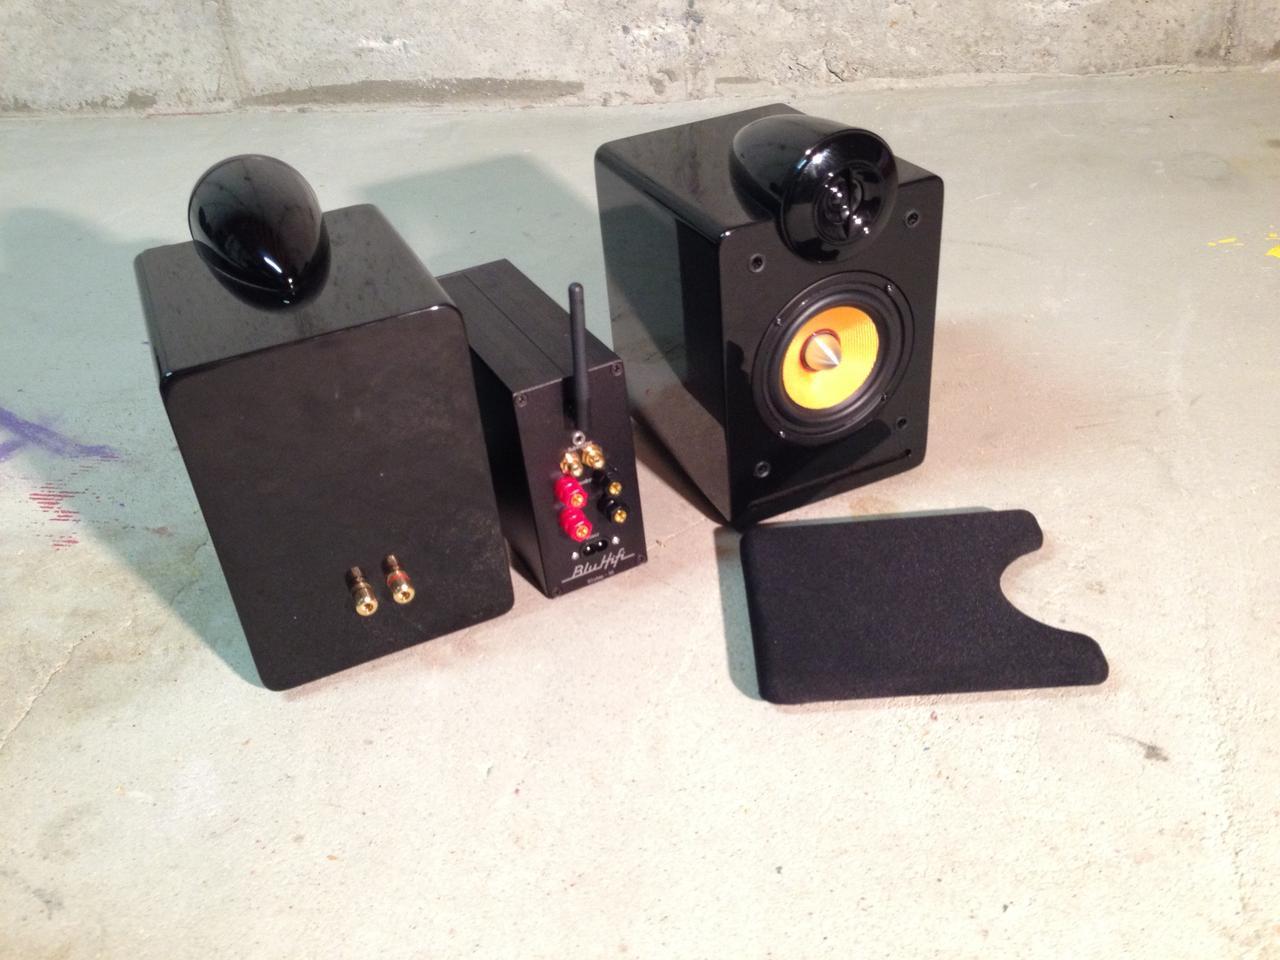 Each BluHifi bookshelf speaker has a 1-inch dome tweeter and 4-inch long-throw kevlar woofer